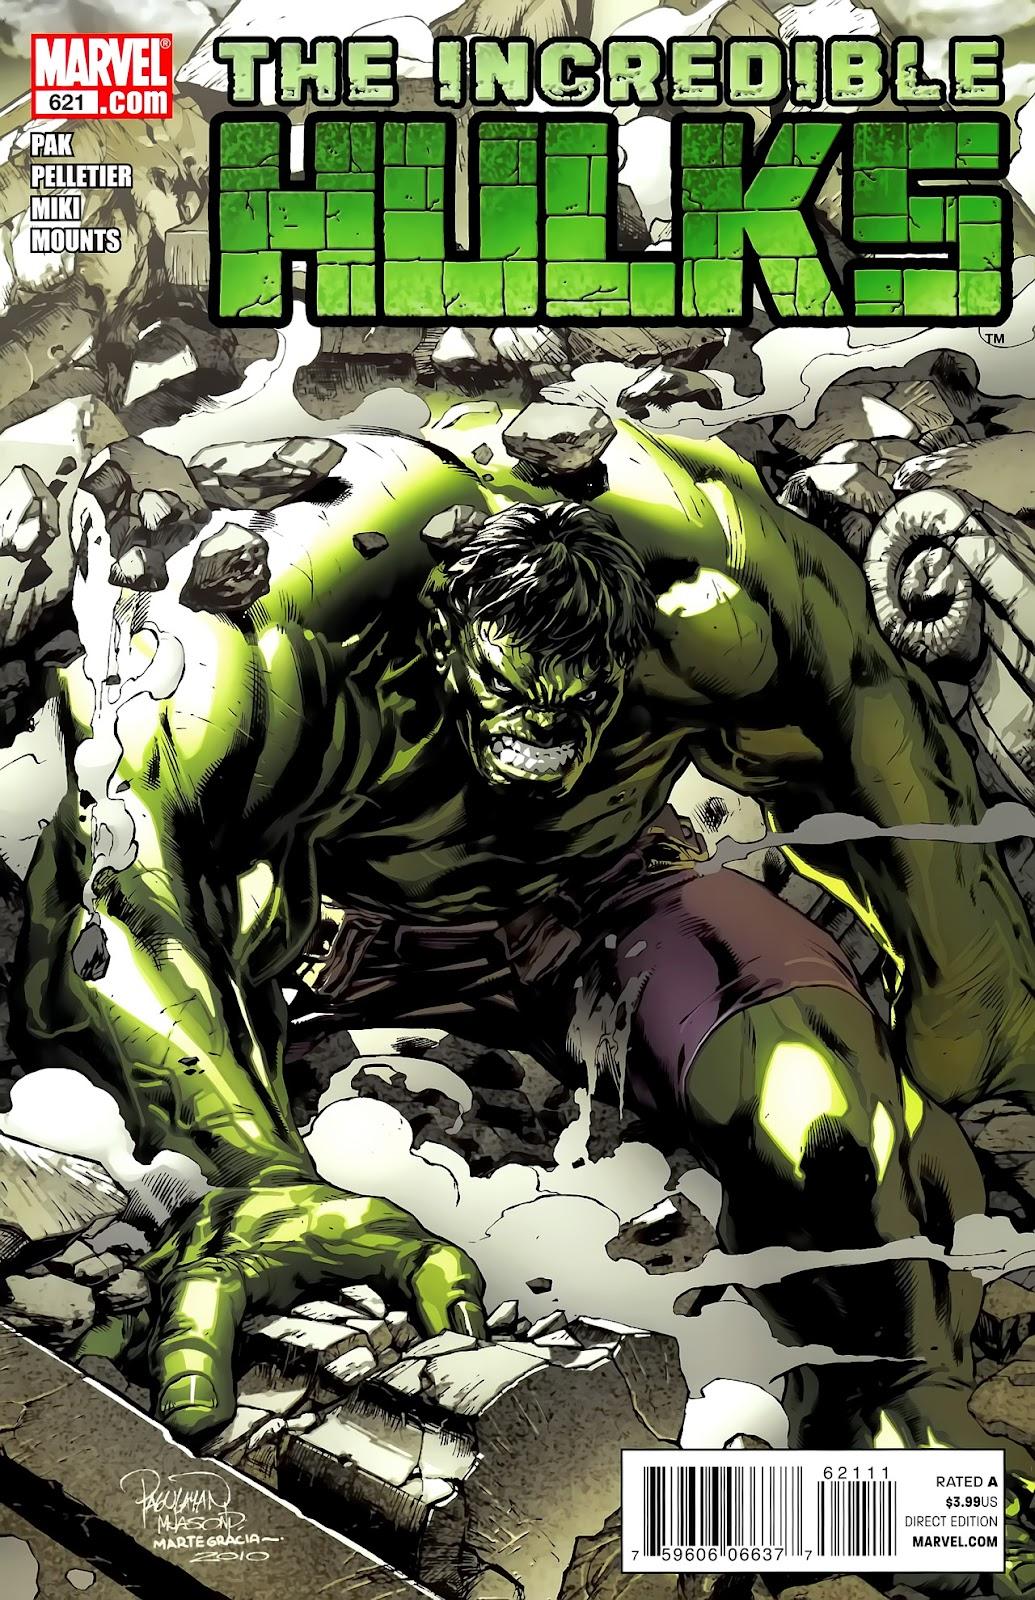 Incredible Hulks (2010) Issue #621 #11 - English 1